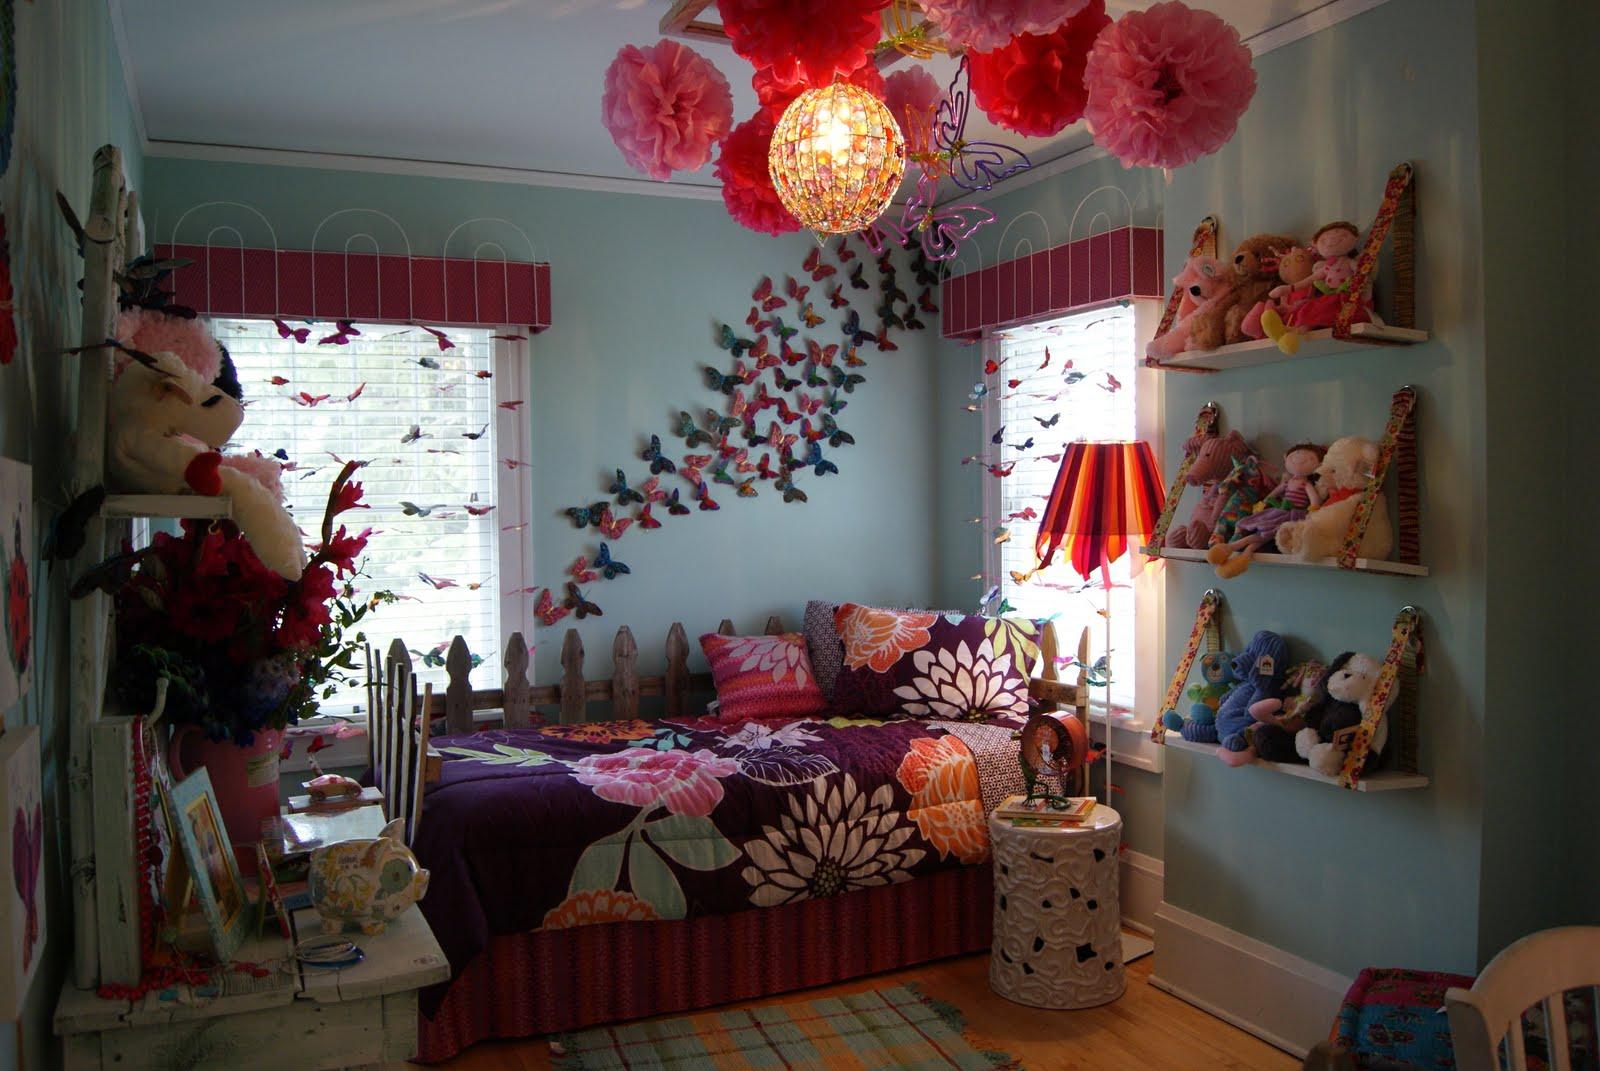 Little Girls Butterfly Room Ideas For Bedroom Best Paper Butterfly Room Decor 1600x1071 Download Hd Wallpaper Wallpapertip